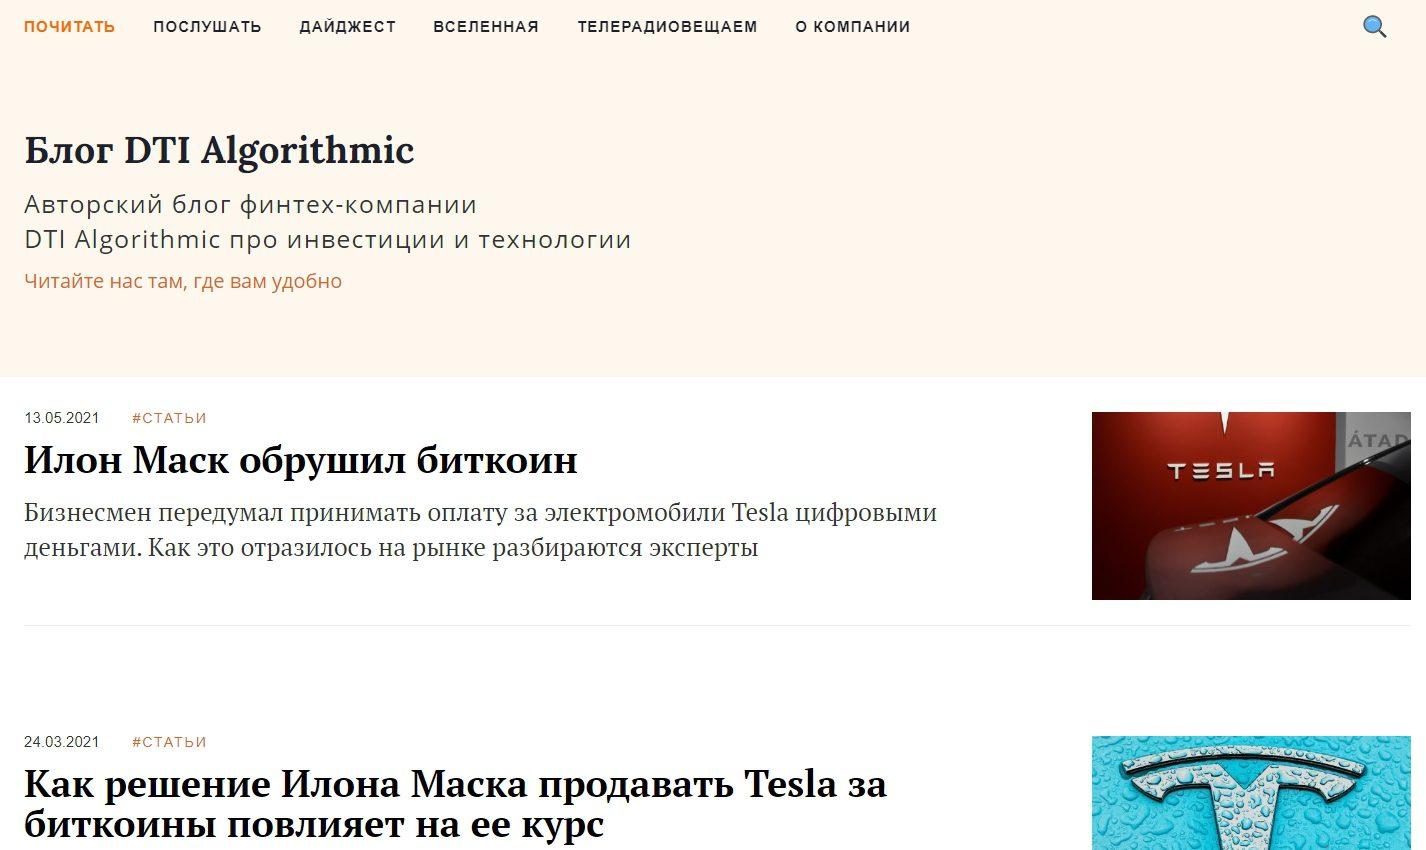 Блог DTI Algorithmic Александра Бутманова